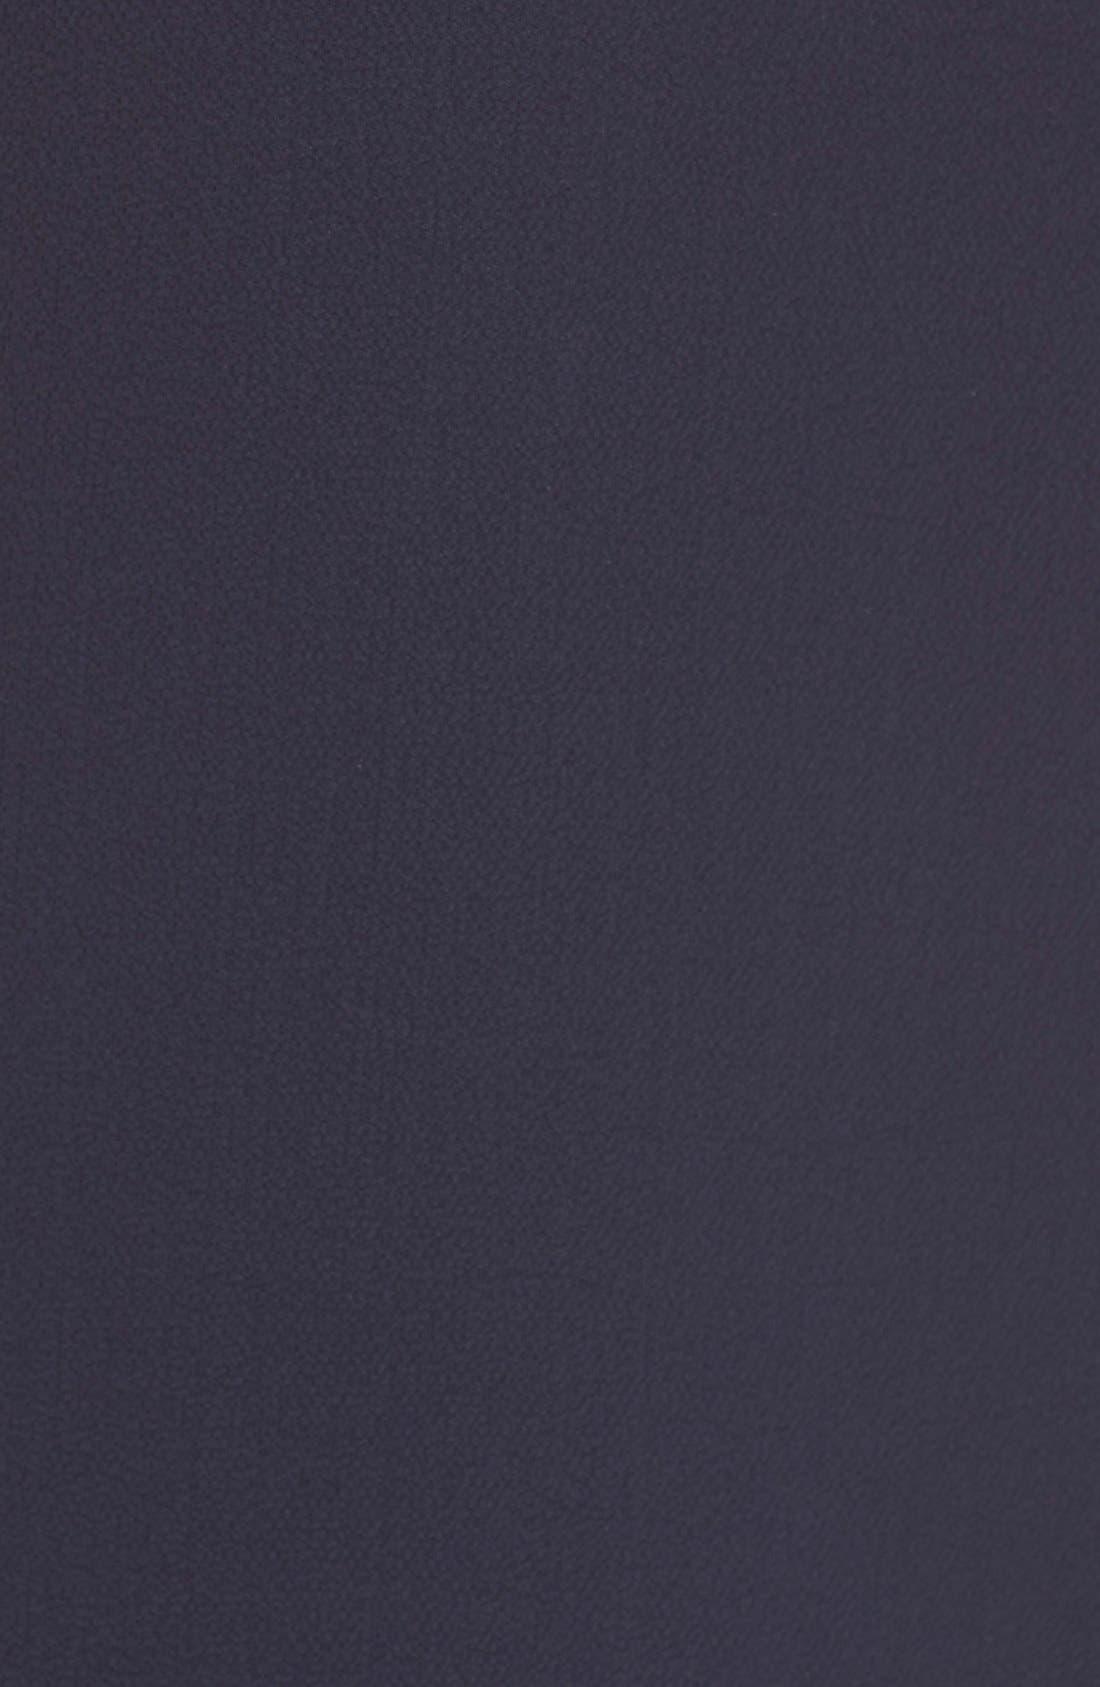 Crepe Halter Dress,                             Alternate thumbnail 4, color,                             410